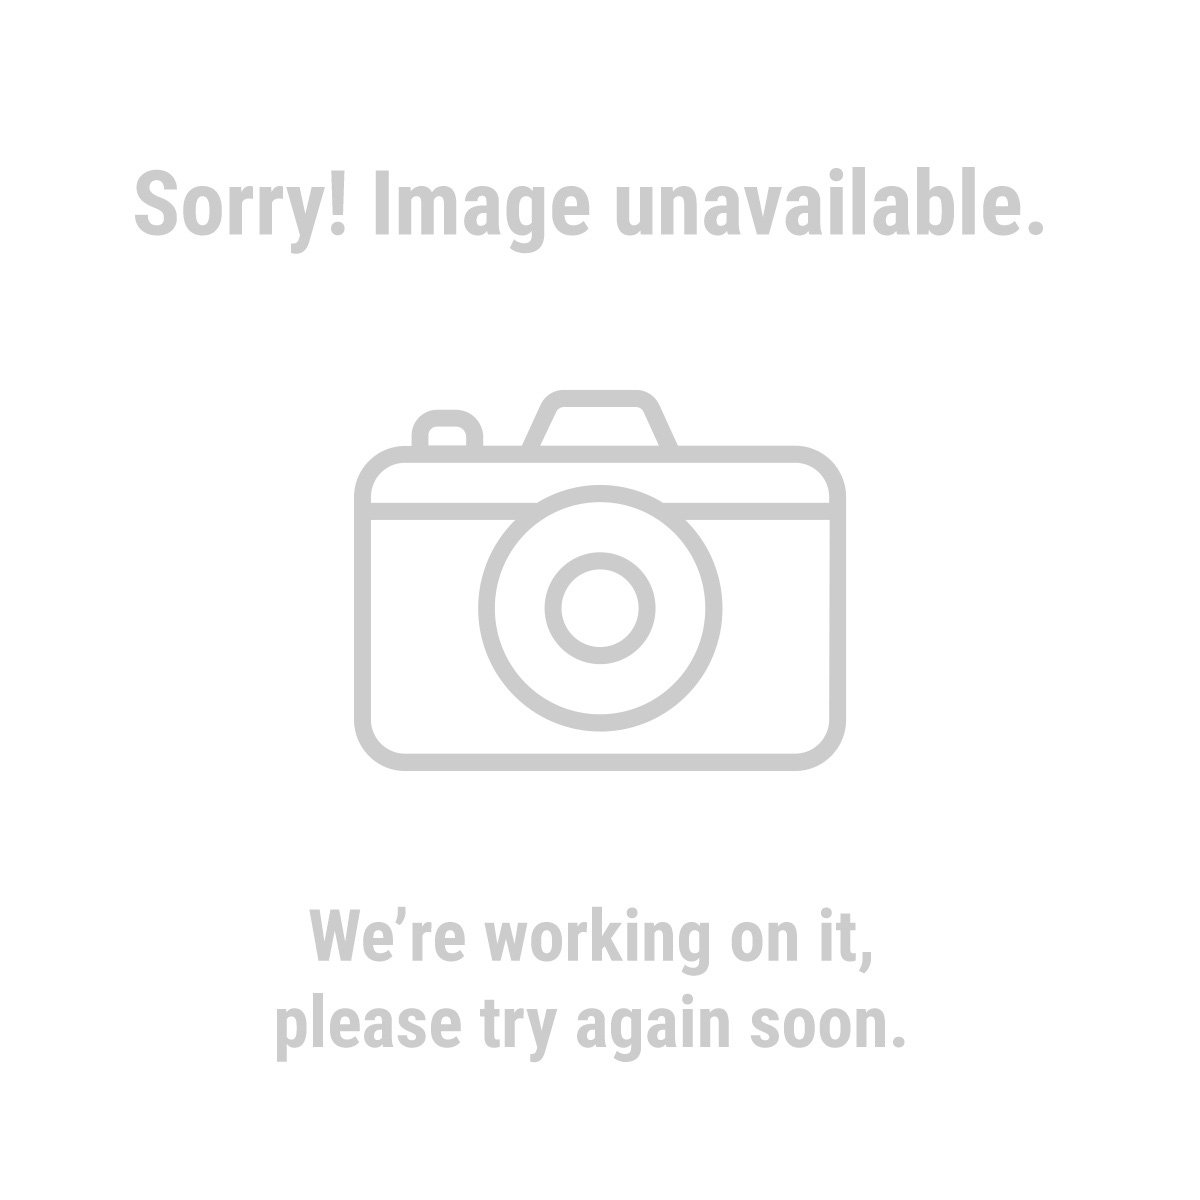 Haul-Master 60760 23 Piece Elastic Stretch Cords